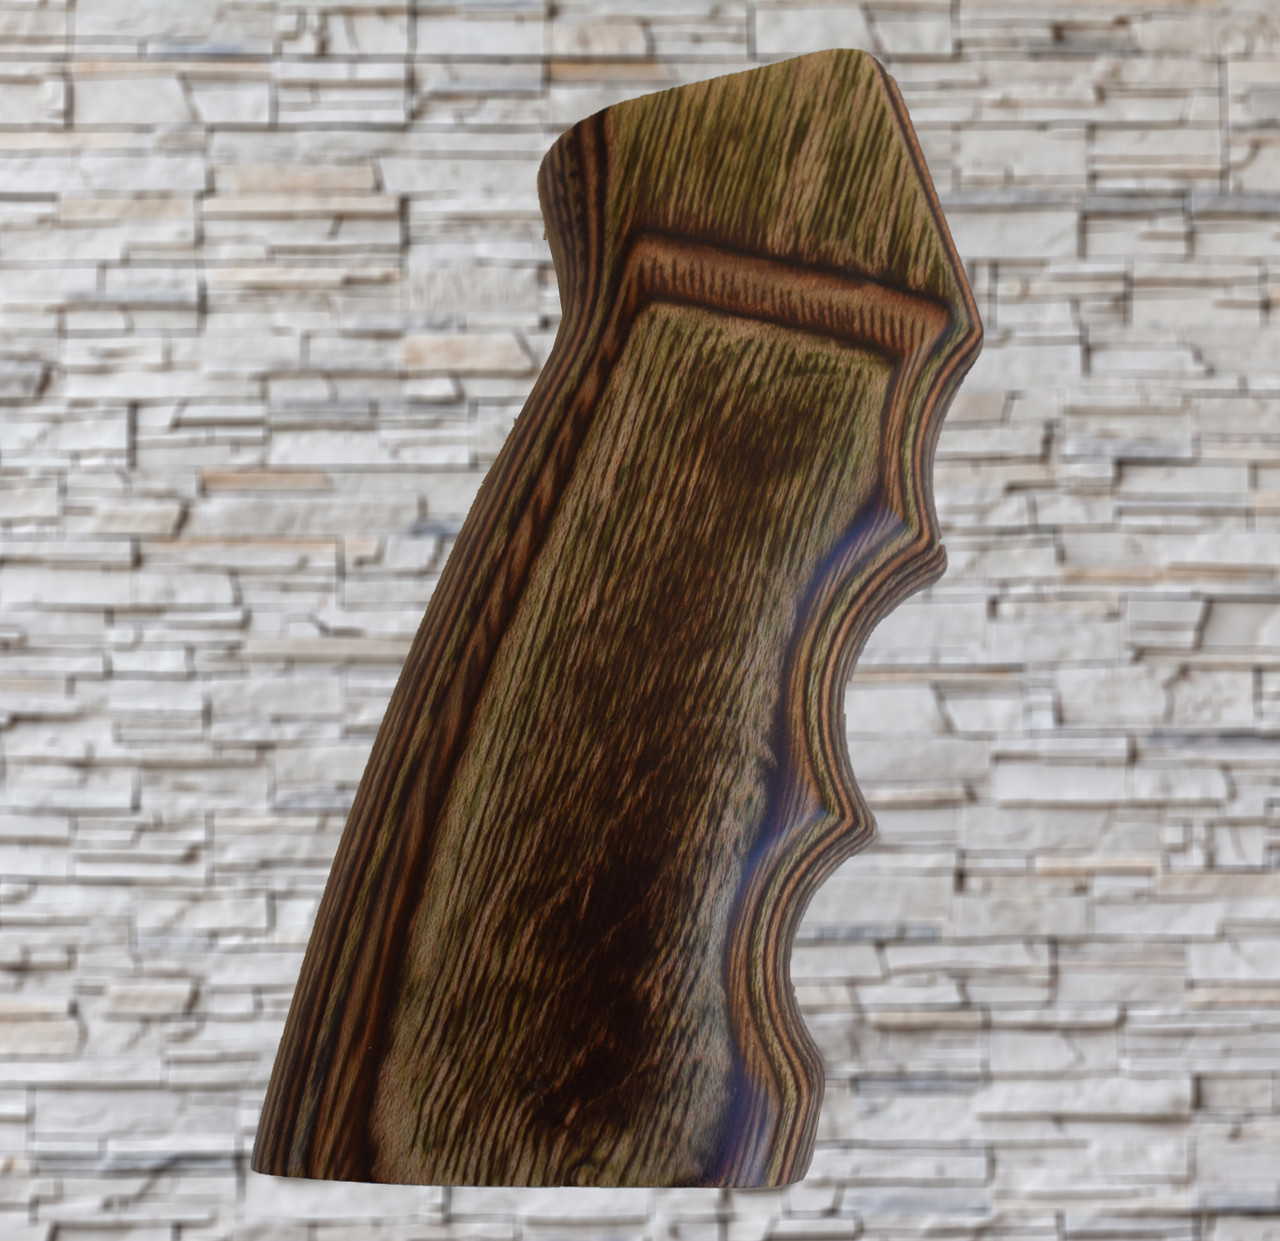 Boyds AR15/M16 Finger Groove Grip Nutmeg